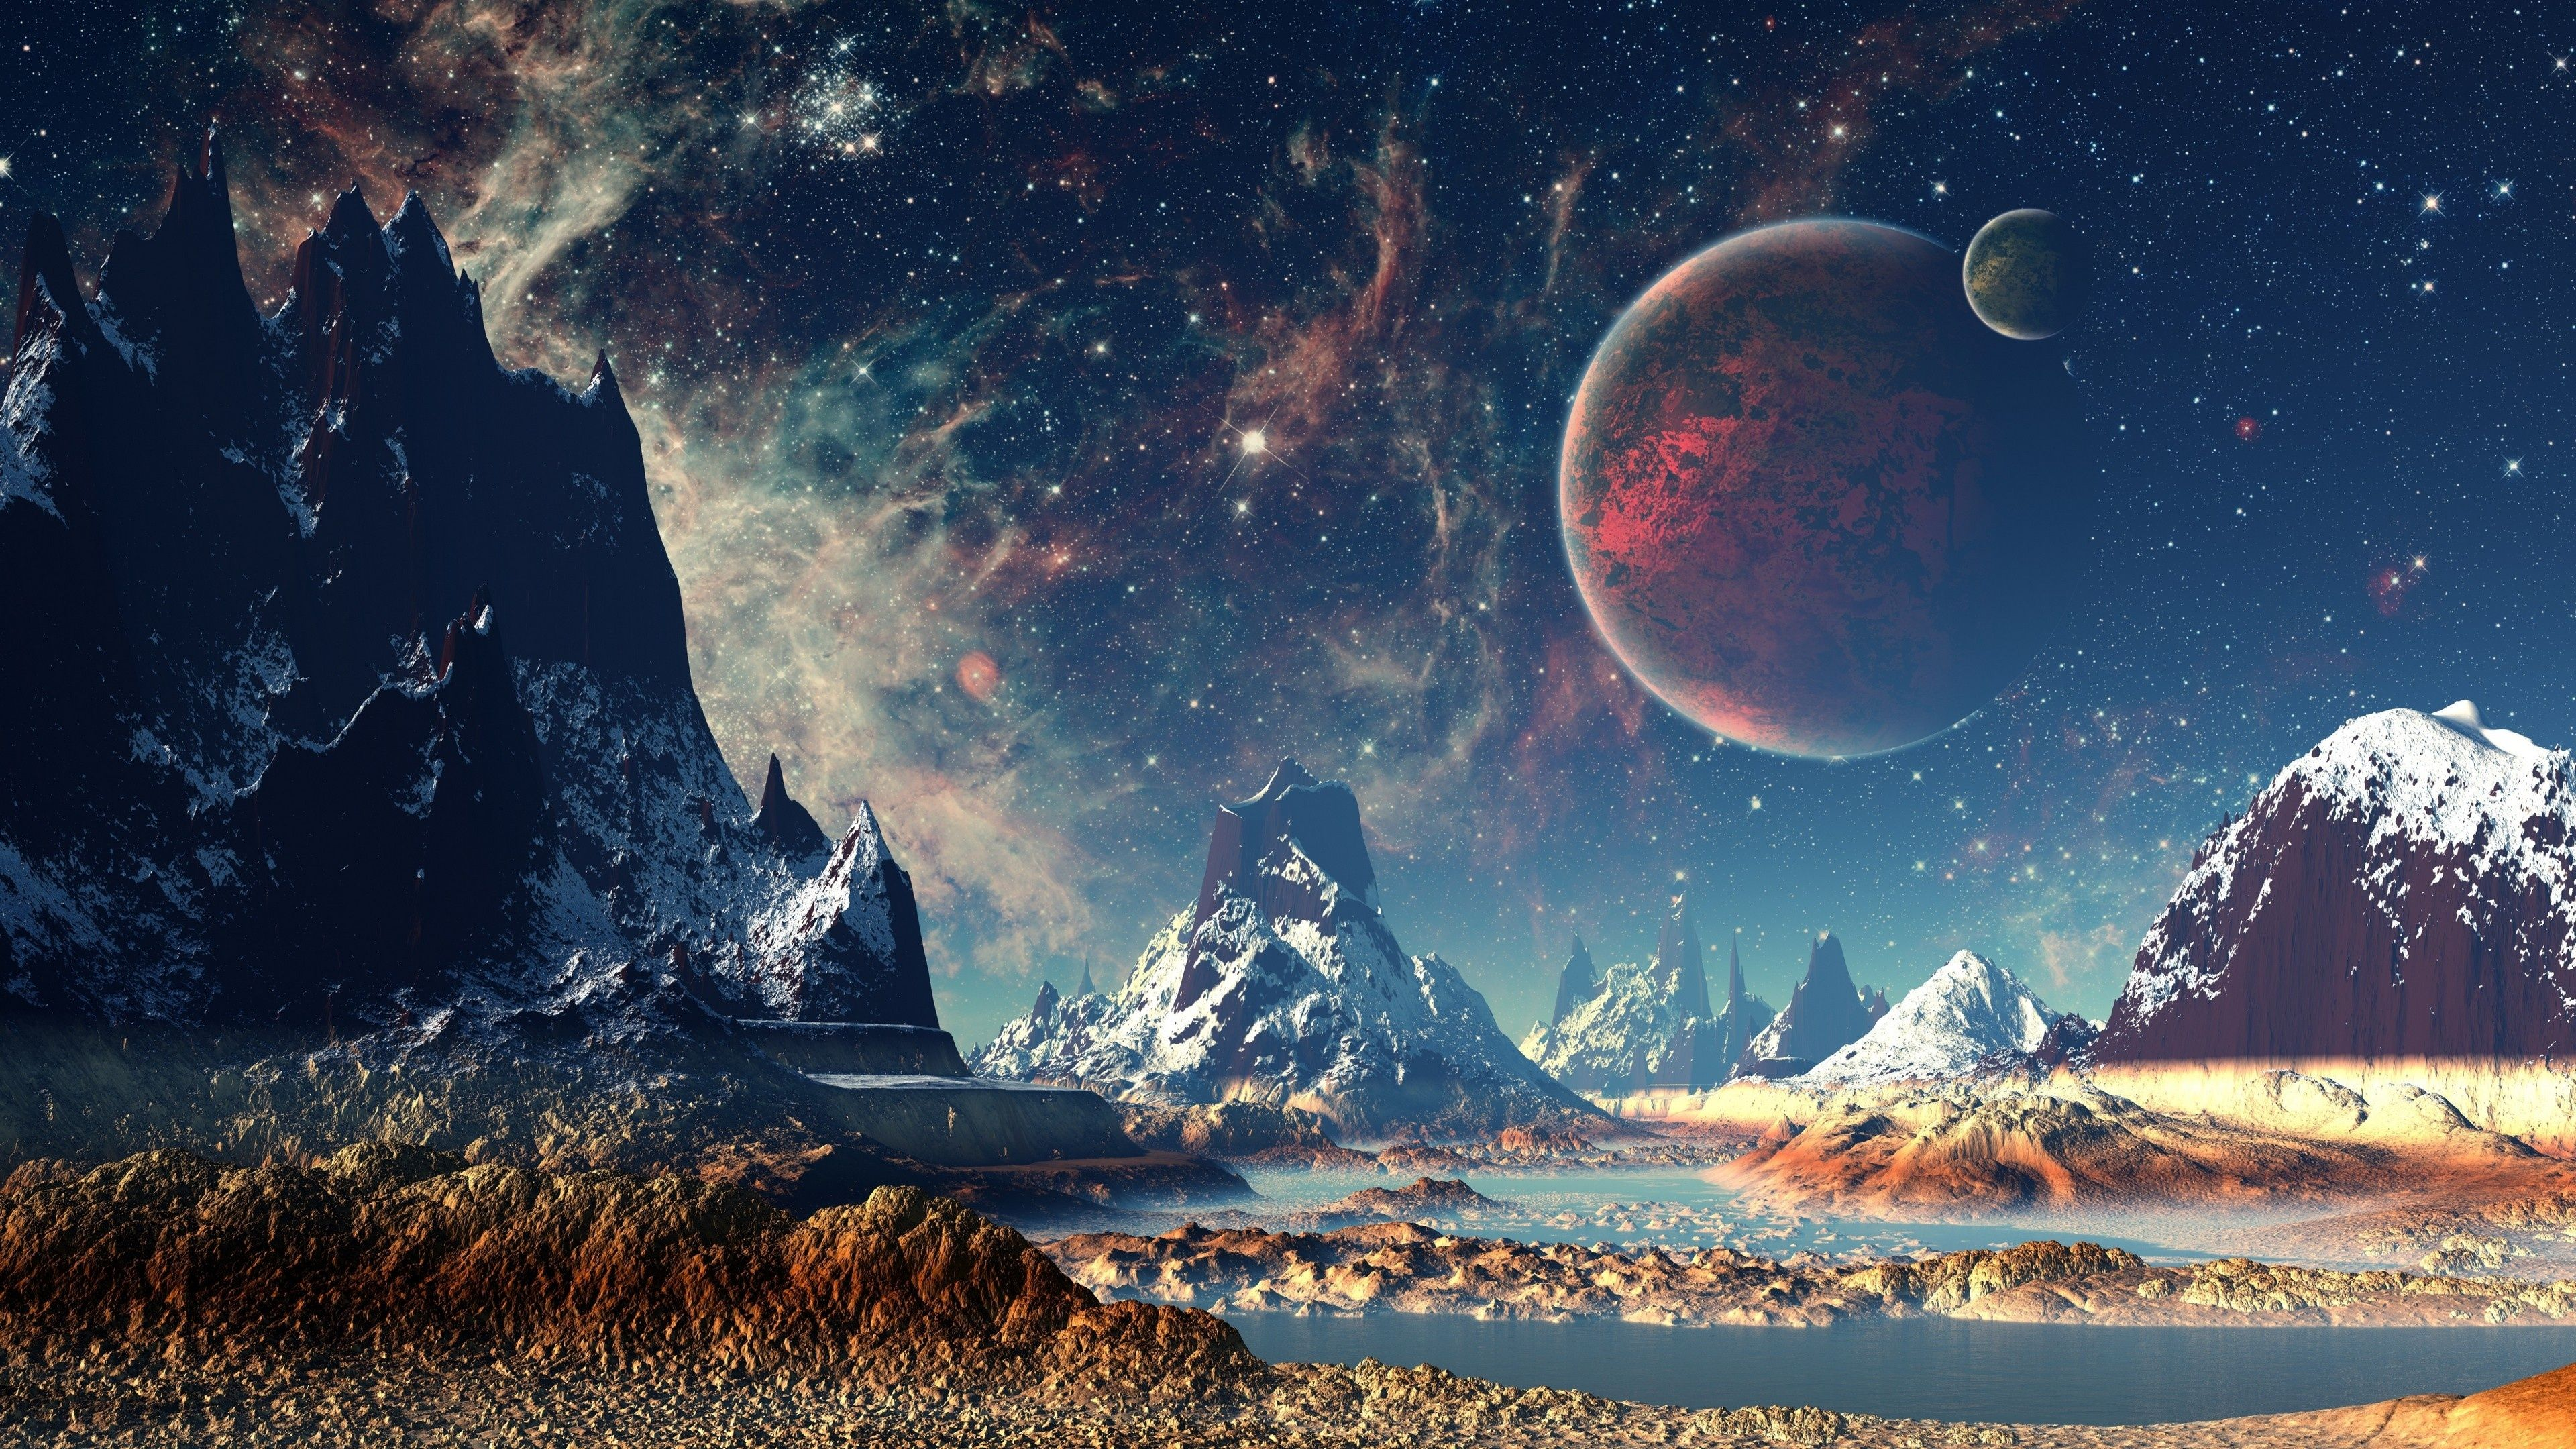 Planet Desktop Wallpapers Planets Wallpaper Landscape Wallpaper Moon Tapestry